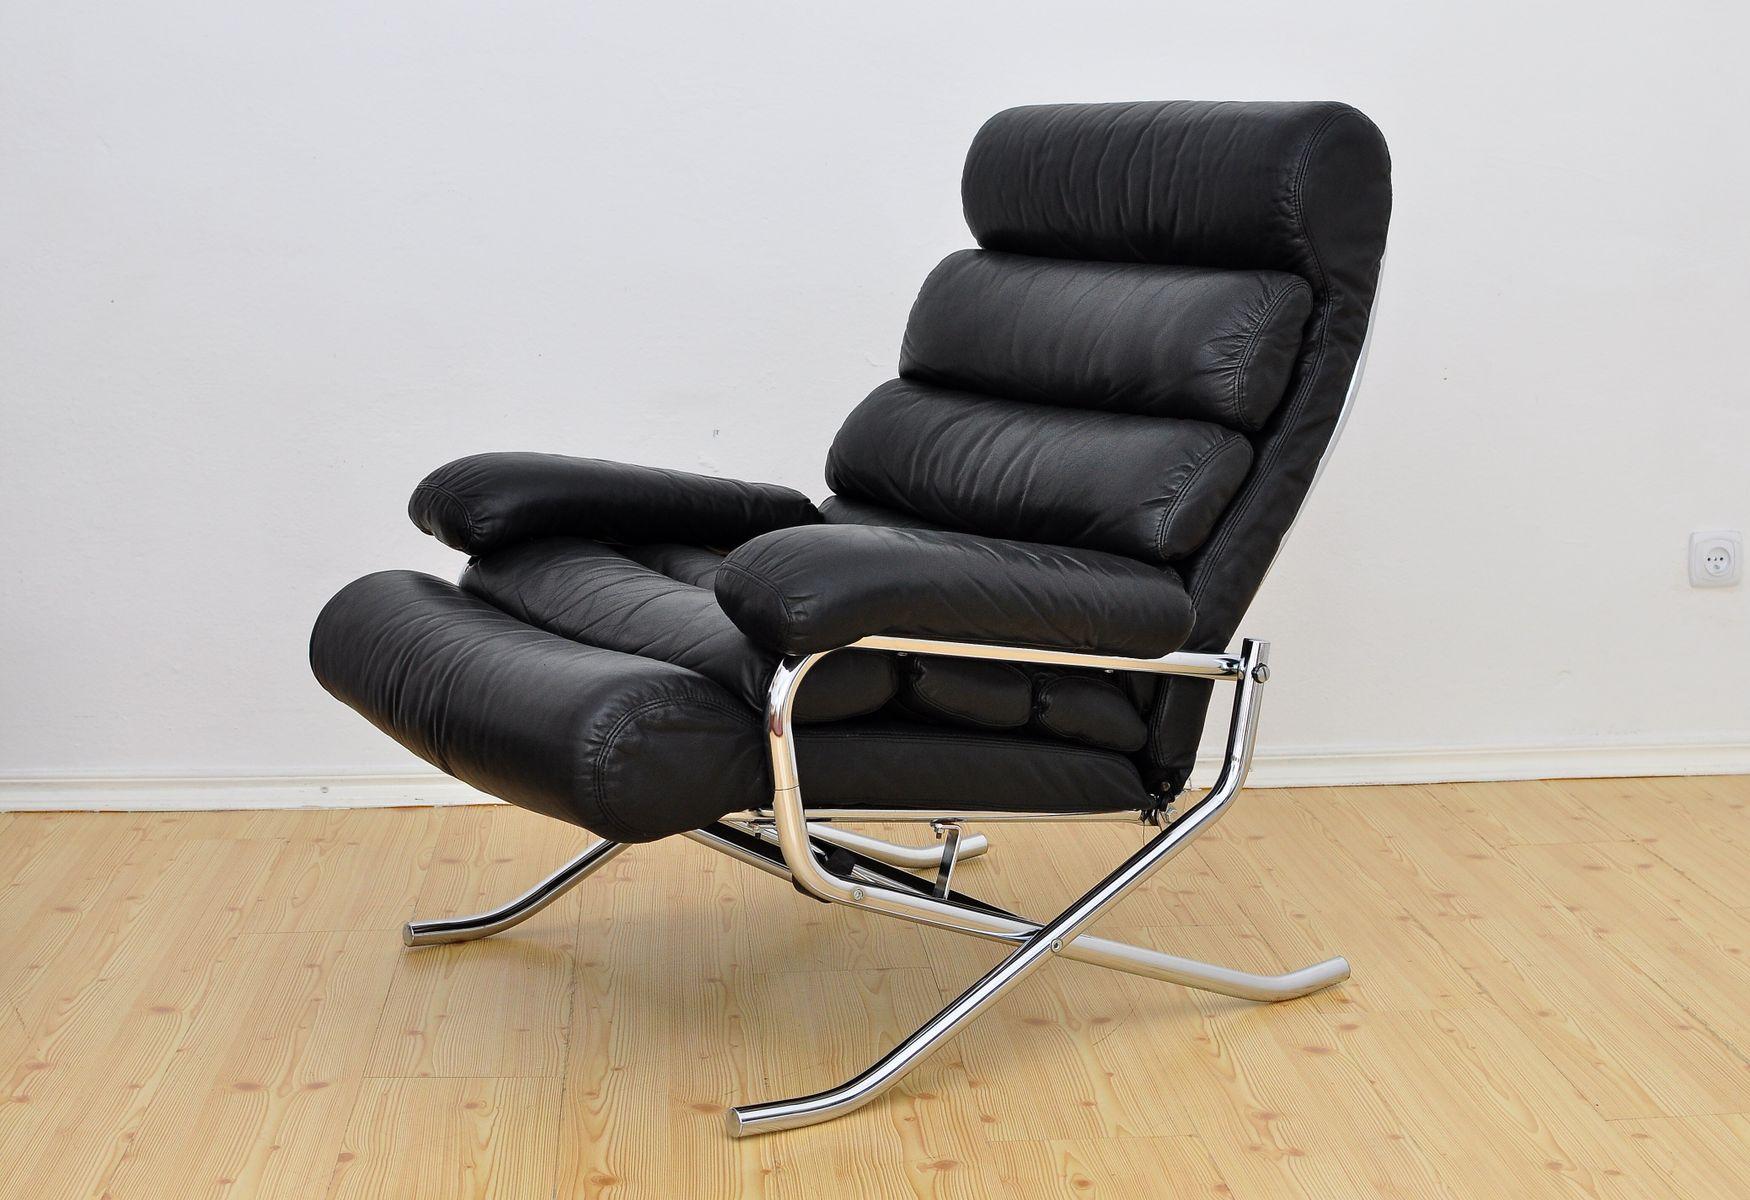 leder lehnsessel mit ottomane 1970er bei pamono kaufen. Black Bedroom Furniture Sets. Home Design Ideas